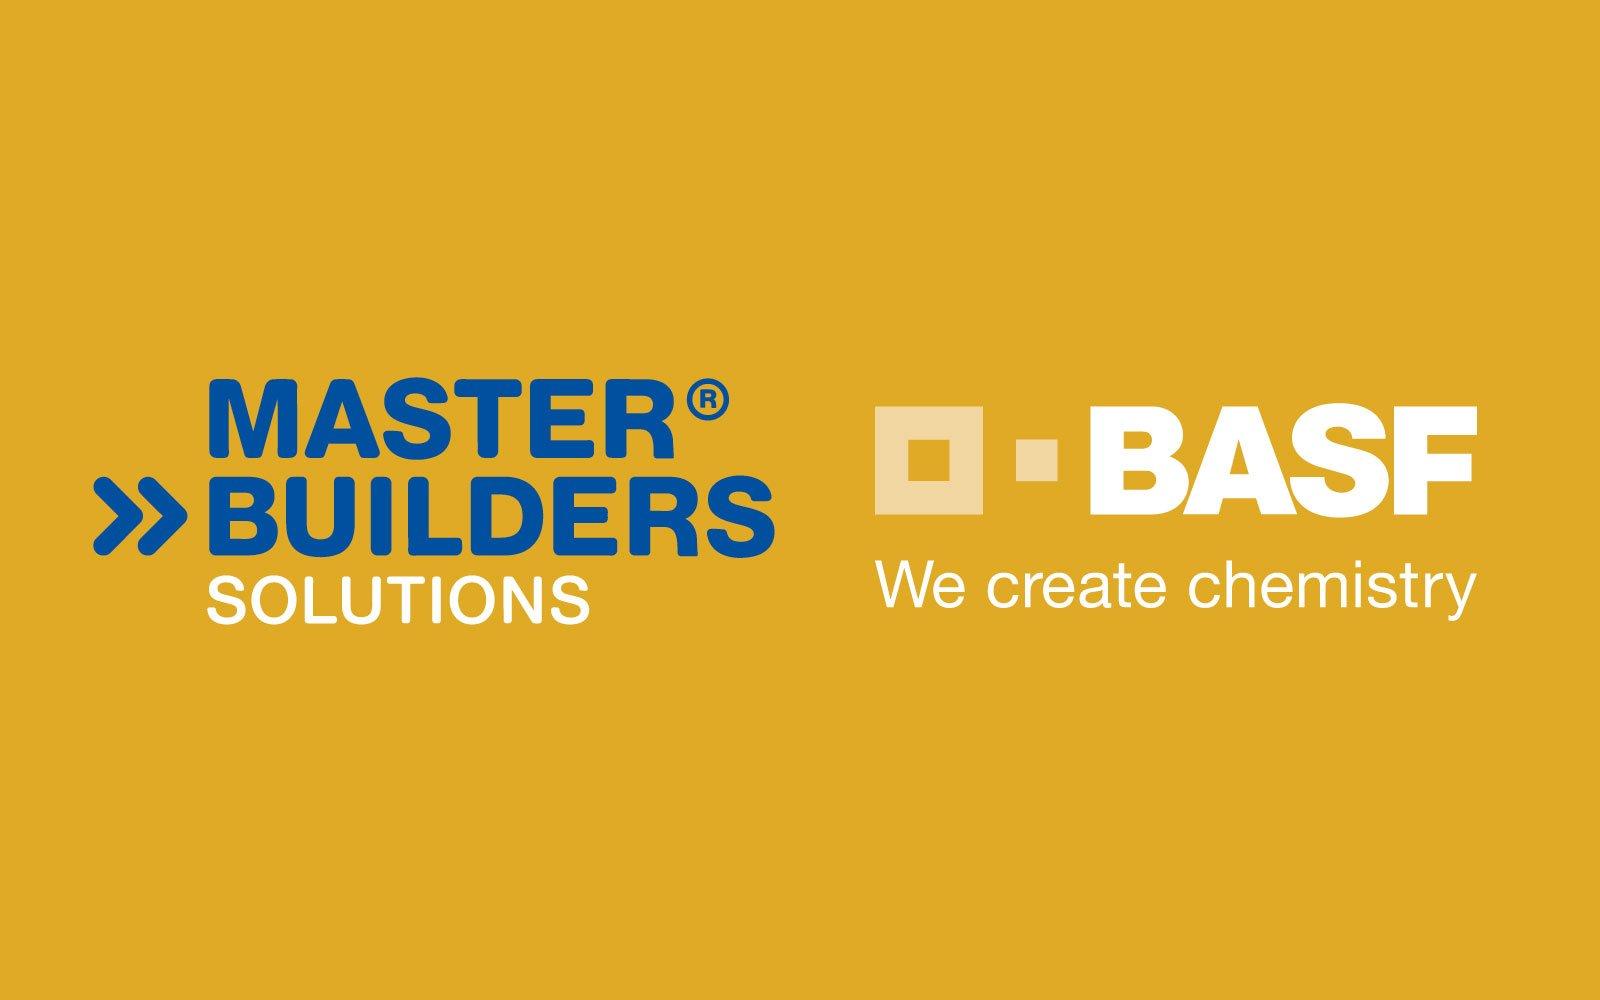 Historia de Master Builders